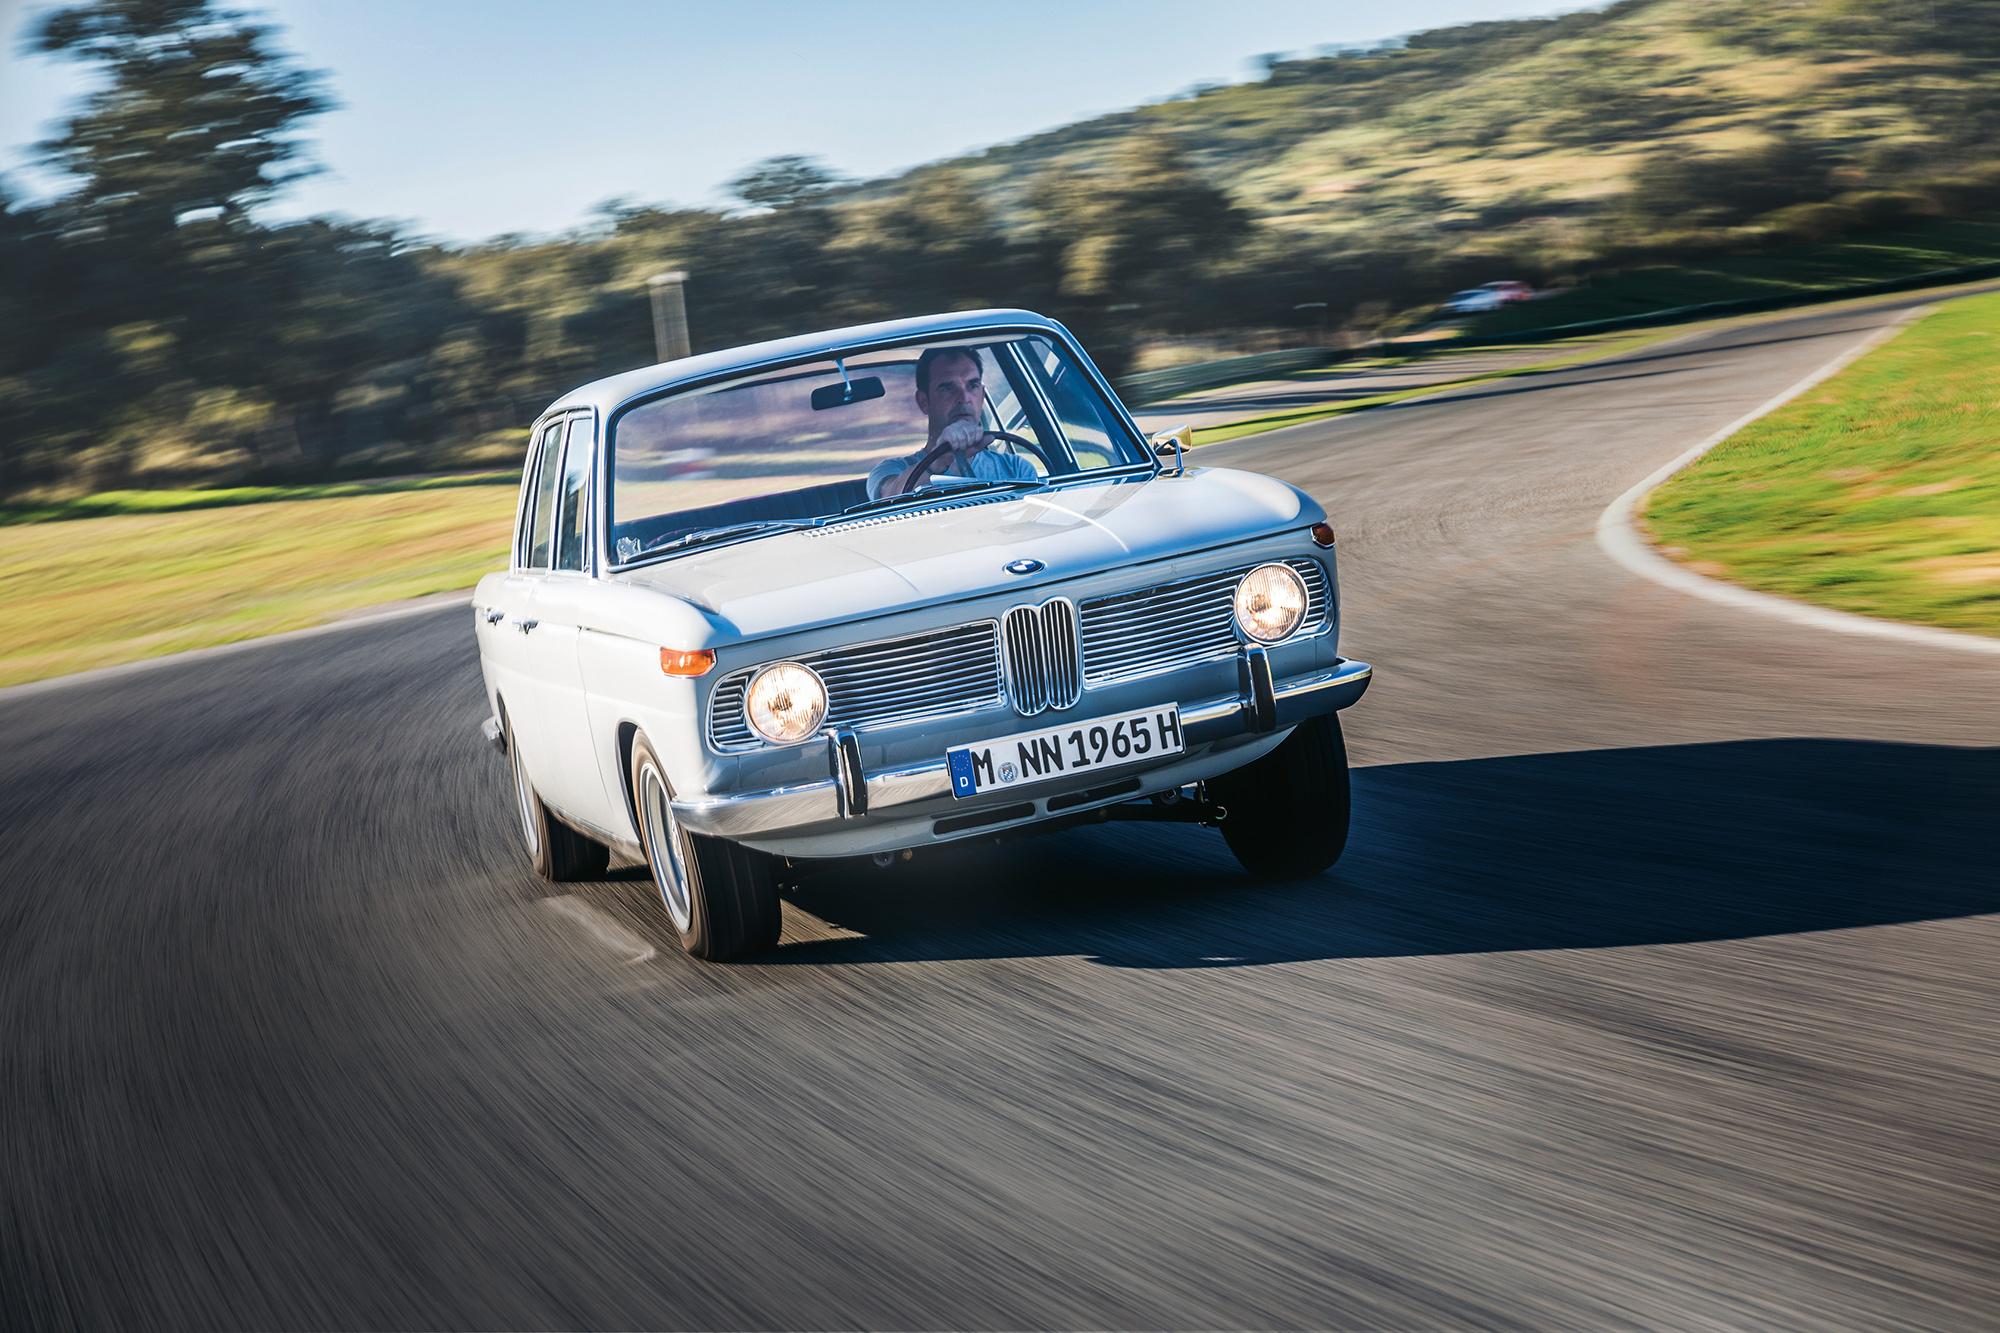 #44, BMW 1800 TI/SA, BMW 2002 Turbo, BMW 3.0 CSL, BMW M3 GT, Tourenwagen, Rennsport